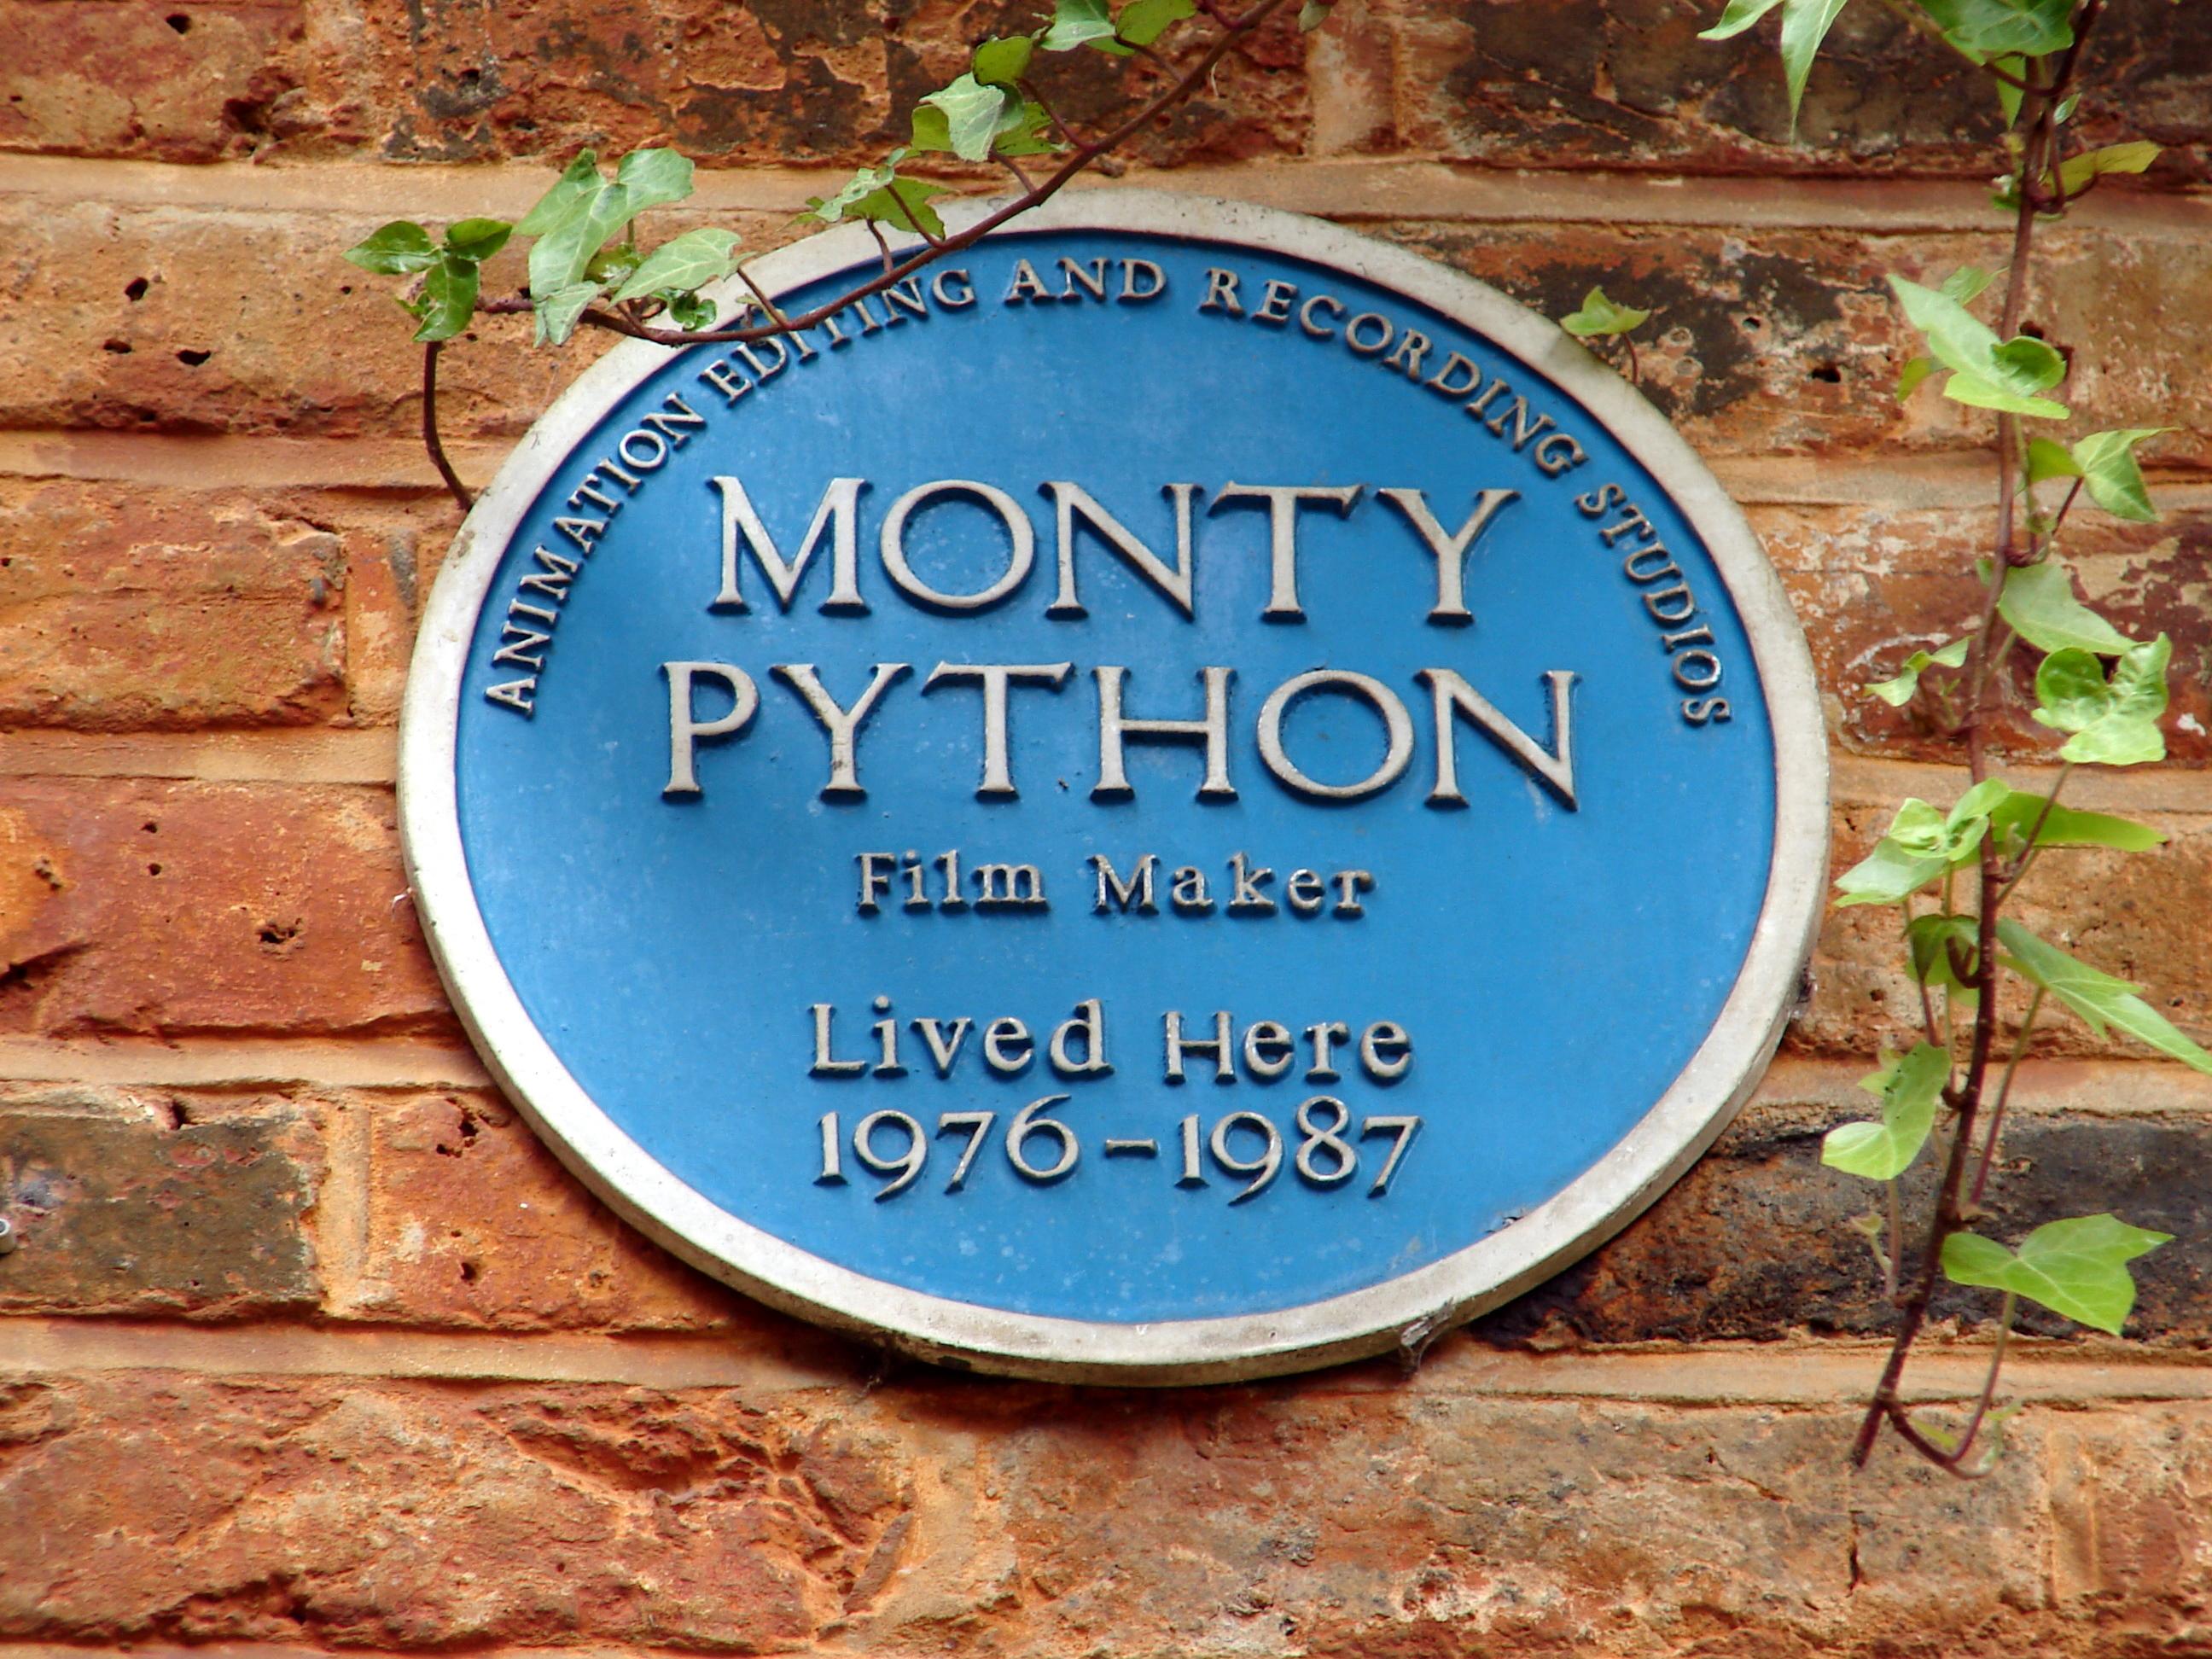 File:Monty Python (4624404749) jpg - Wikimedia Commons